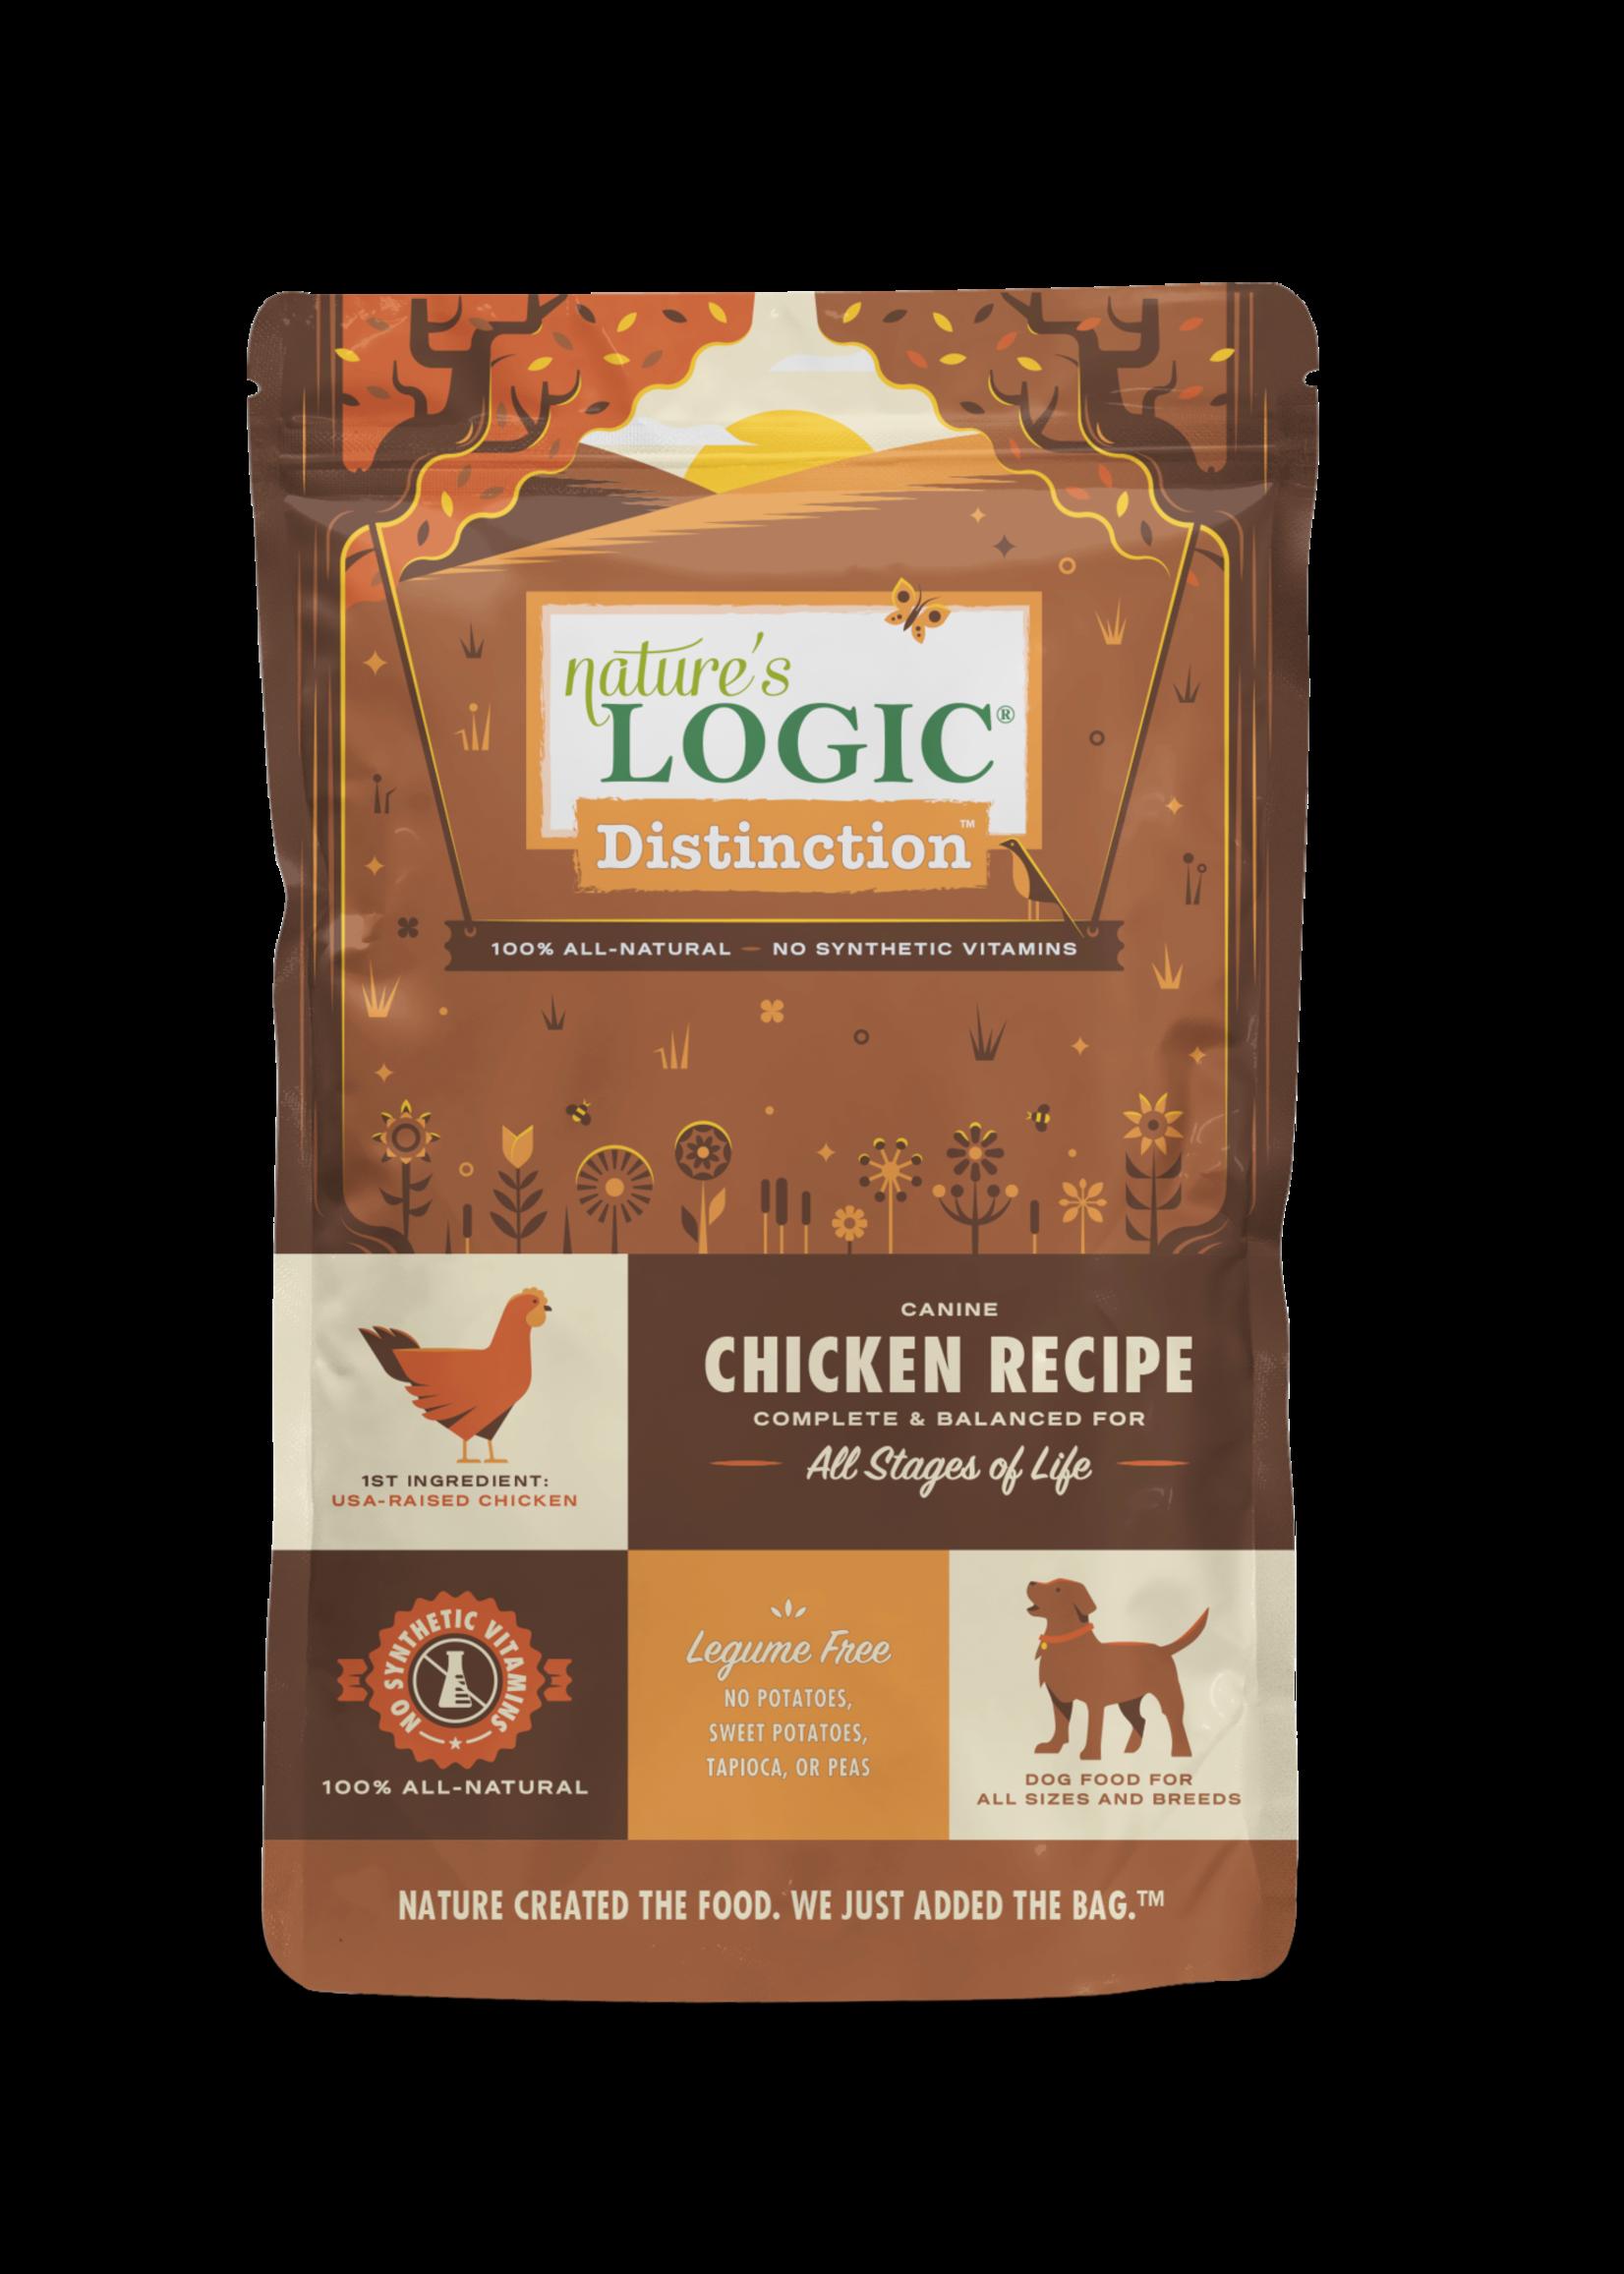 Nature's Logic Nature's Logic Distinction Chicken Dry Dog Food 6lbs